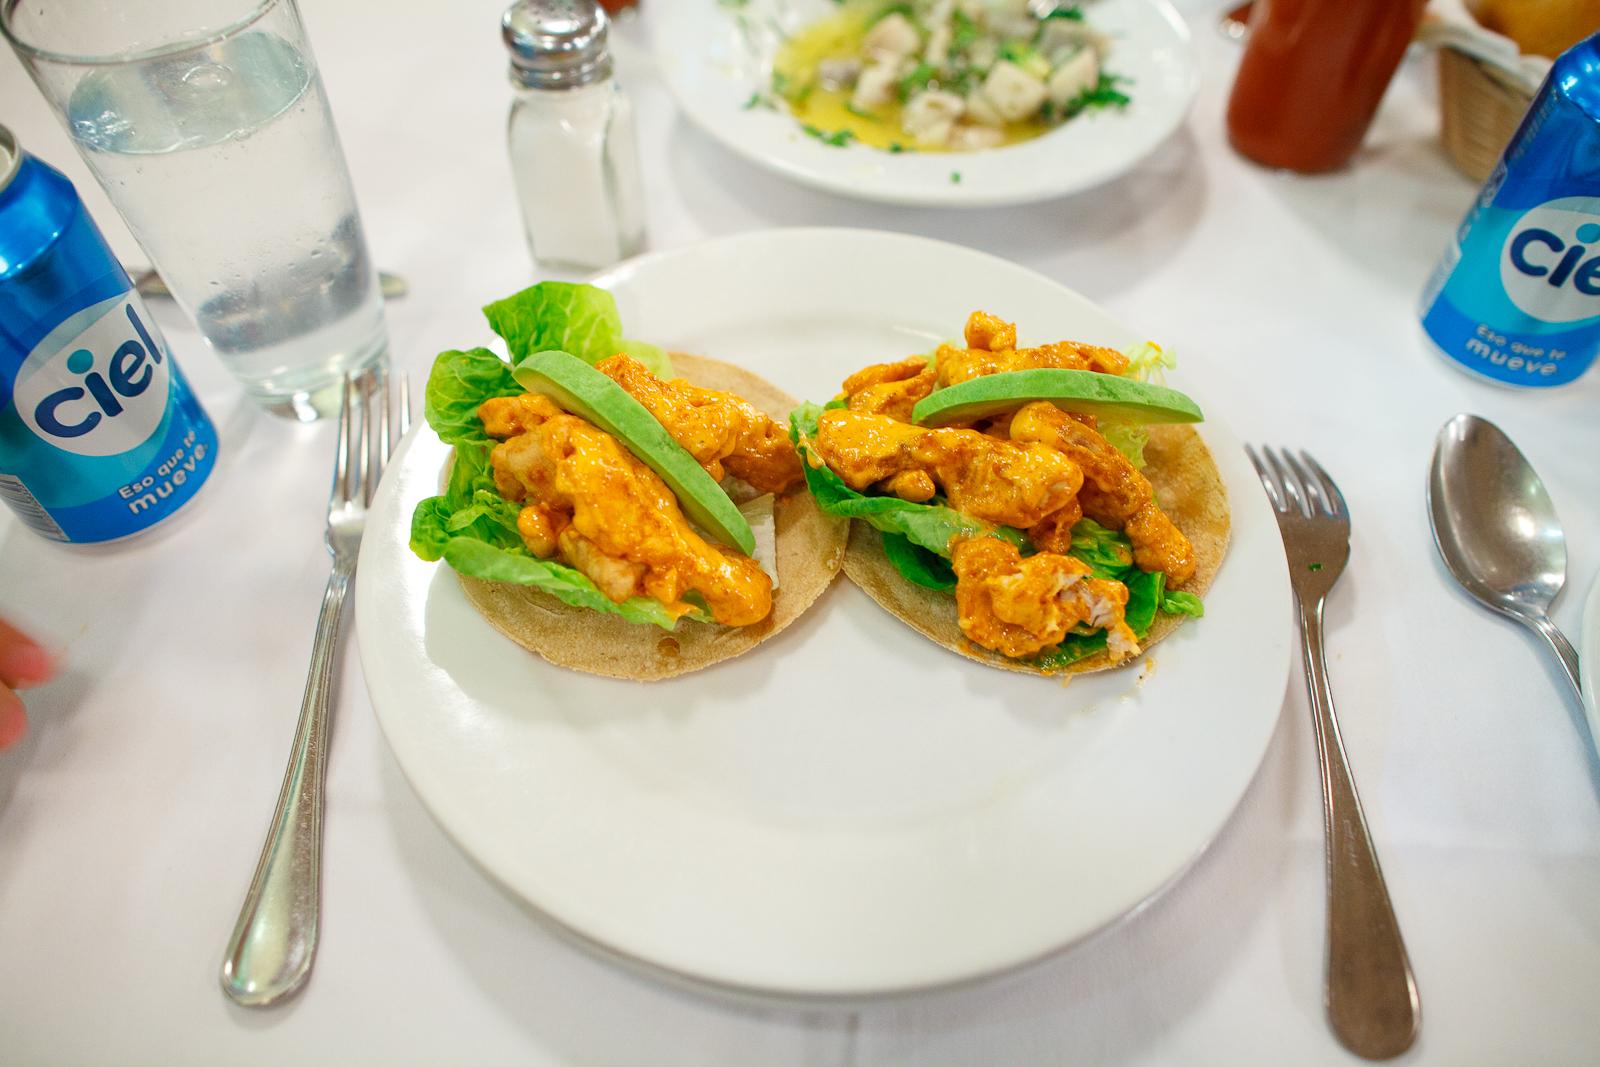 Tacos de pescado empanizado (white fish breaded and fried with spicy mayonnaise)